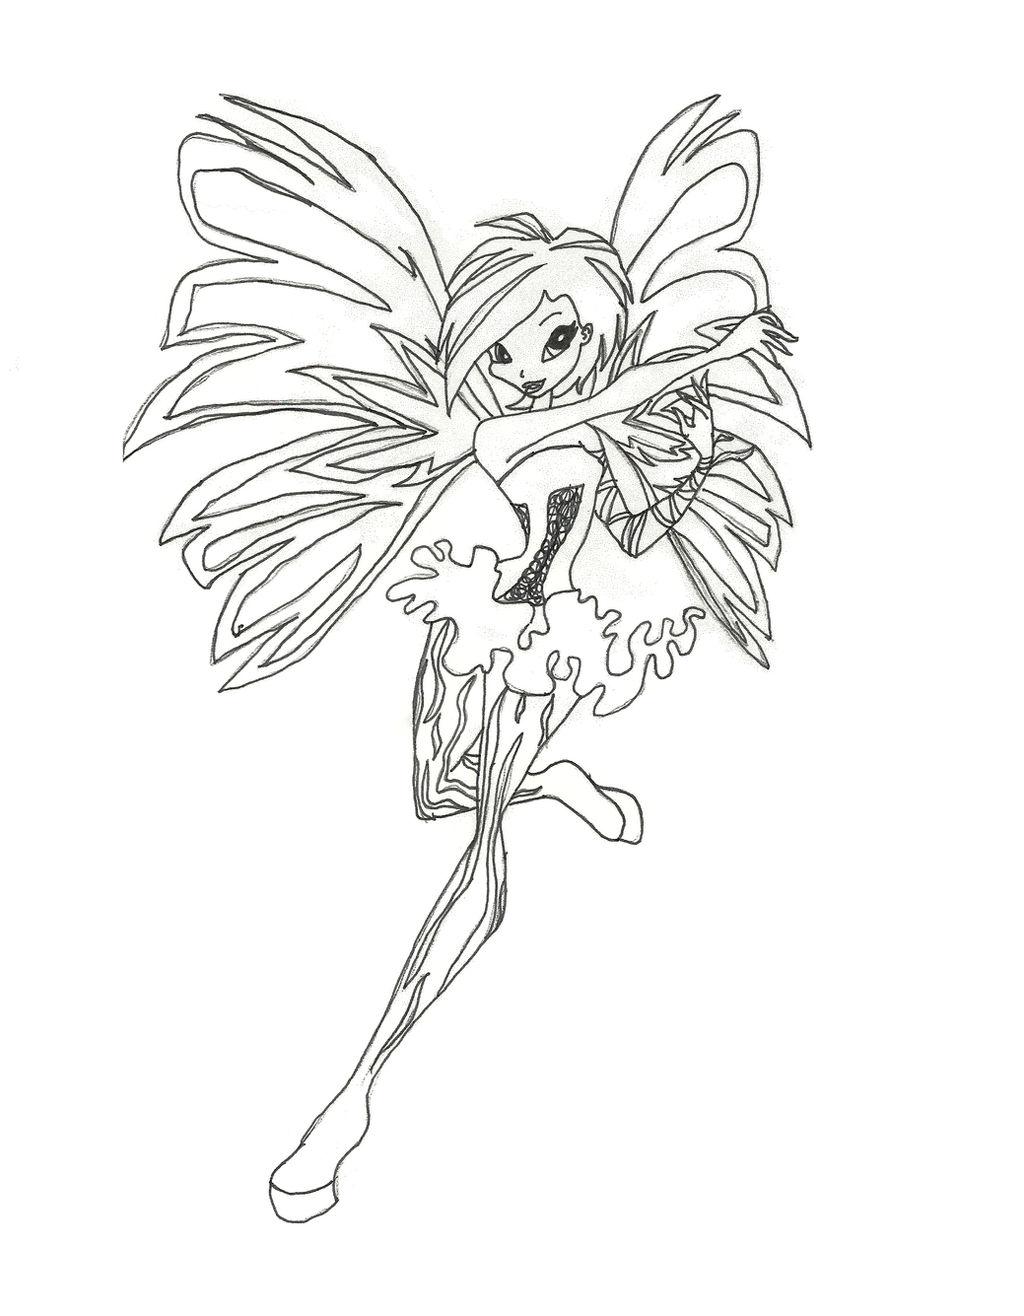 Winx Club Sirenix Tecna Coloring Page By Timefairy237 On Deviantart